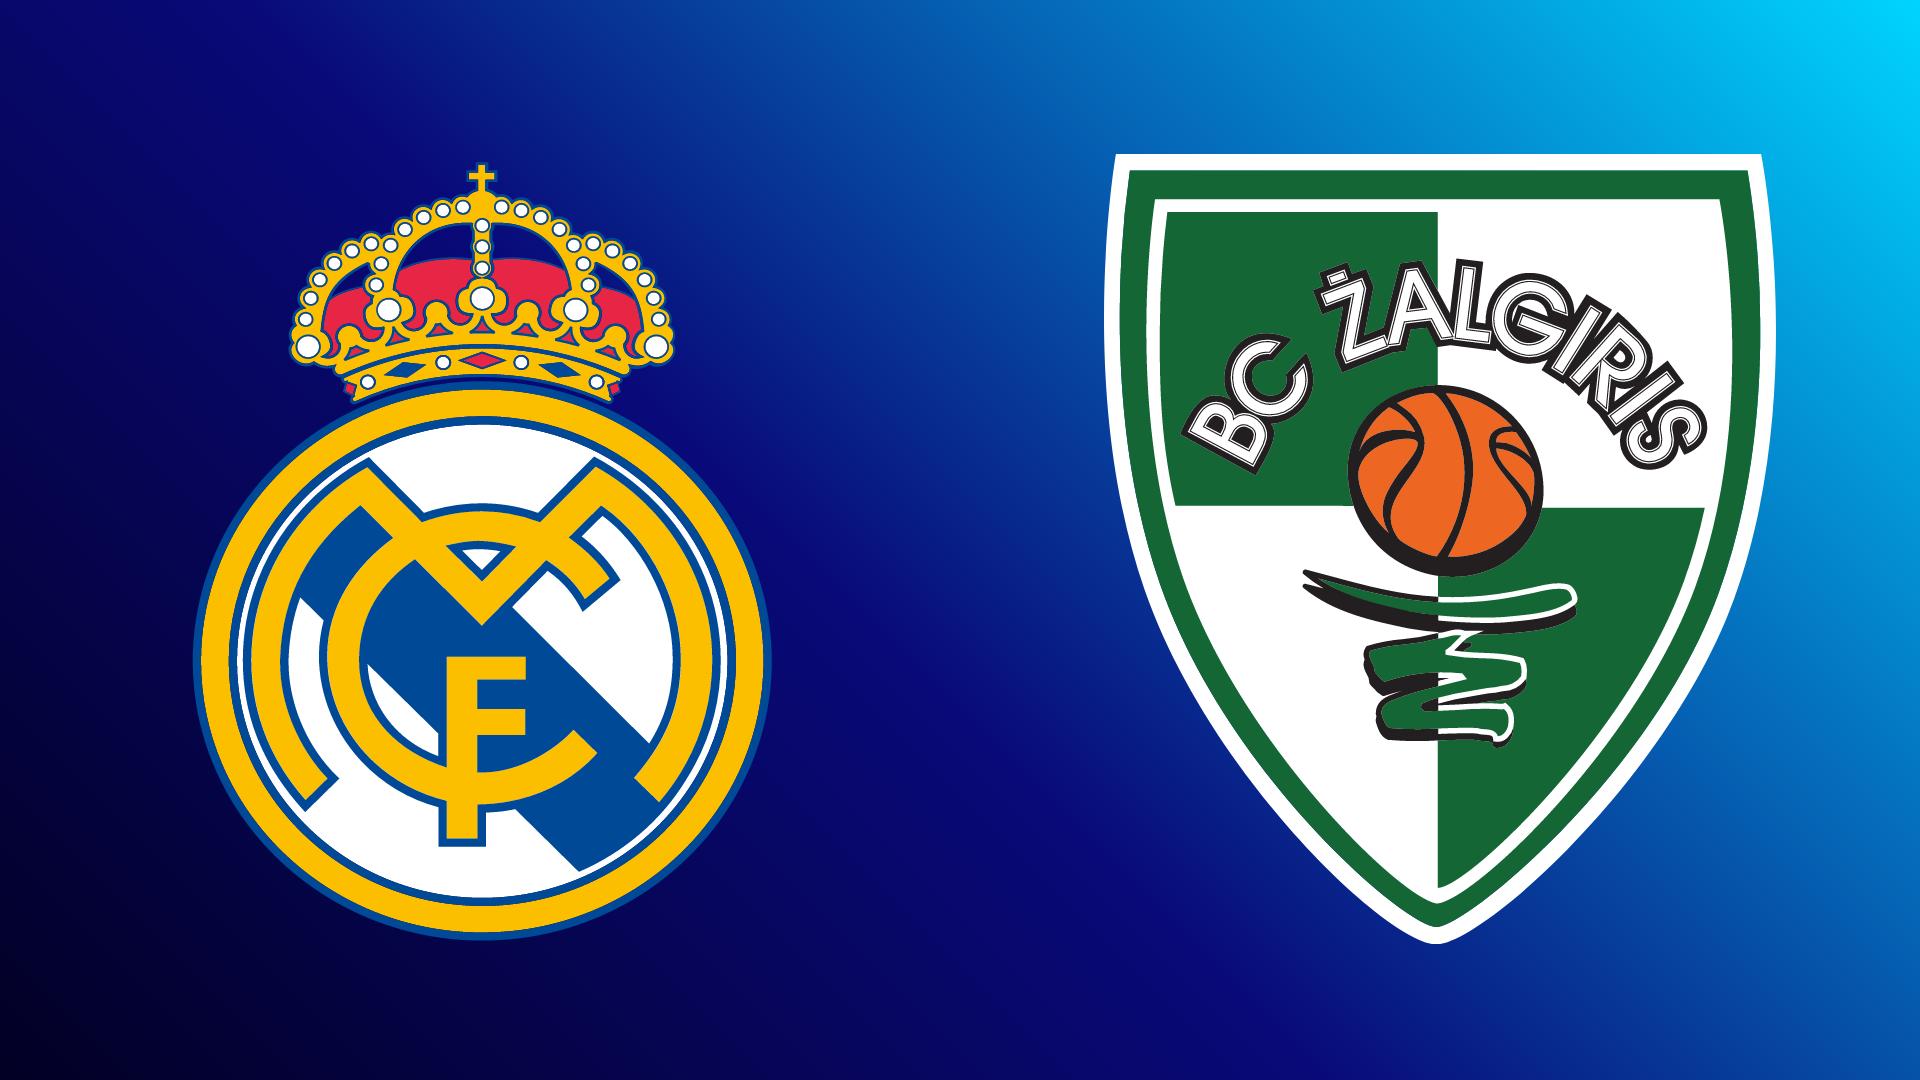 Real Madrid - Zalgiris Kaunas 25.02.2021 um 20:45 Uhr auf Magenta Sport